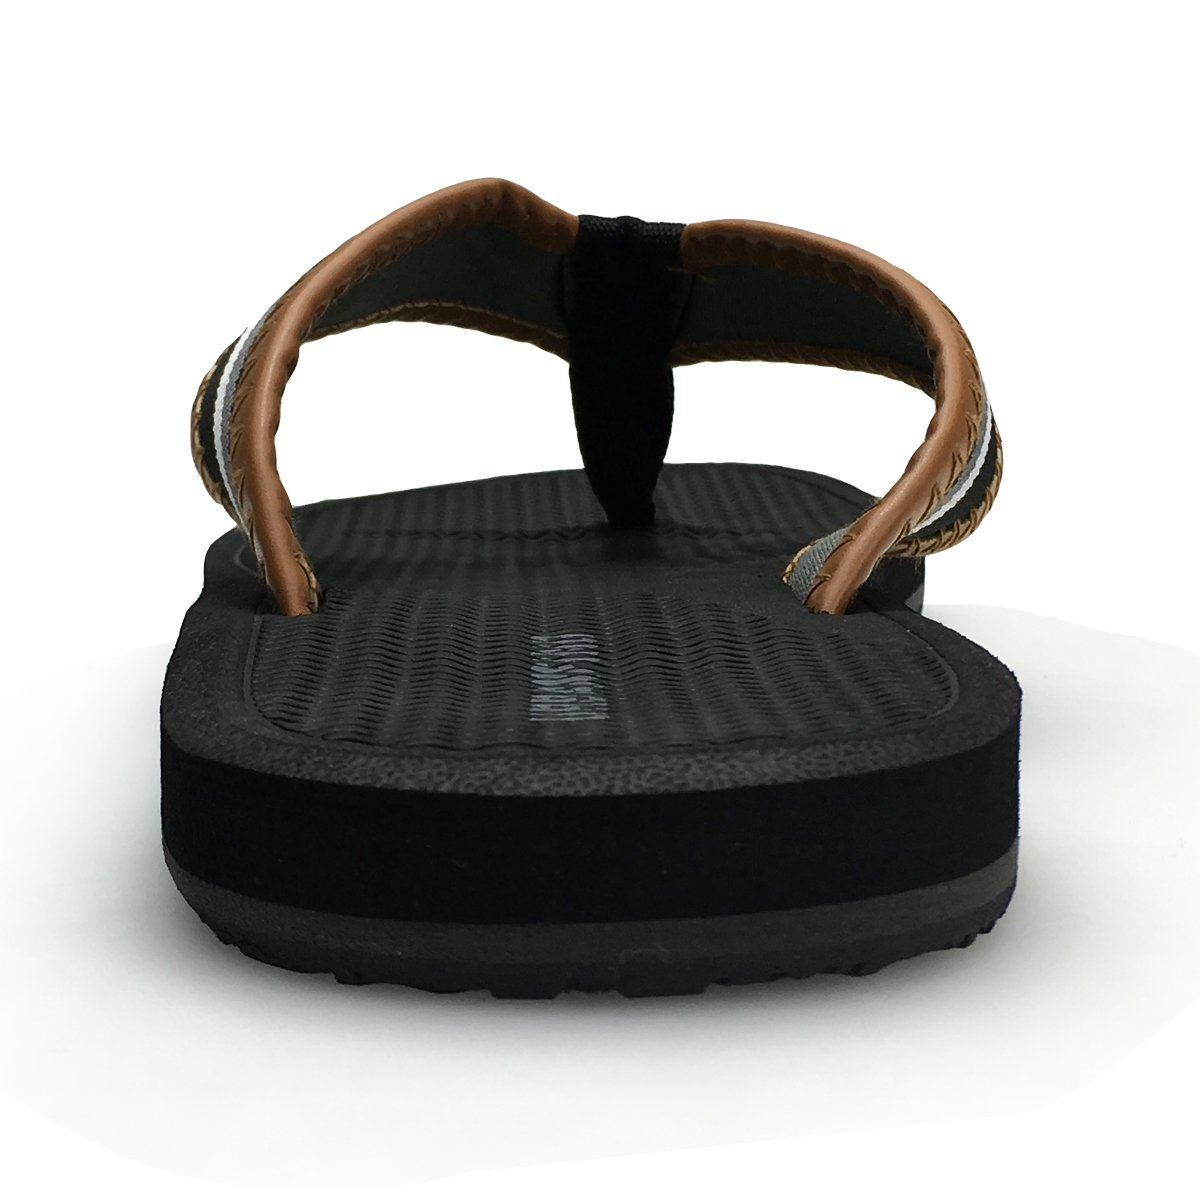 URBANFIND Men\' Retro British Style Flip Flops Slippers Black, 8 D(M) US